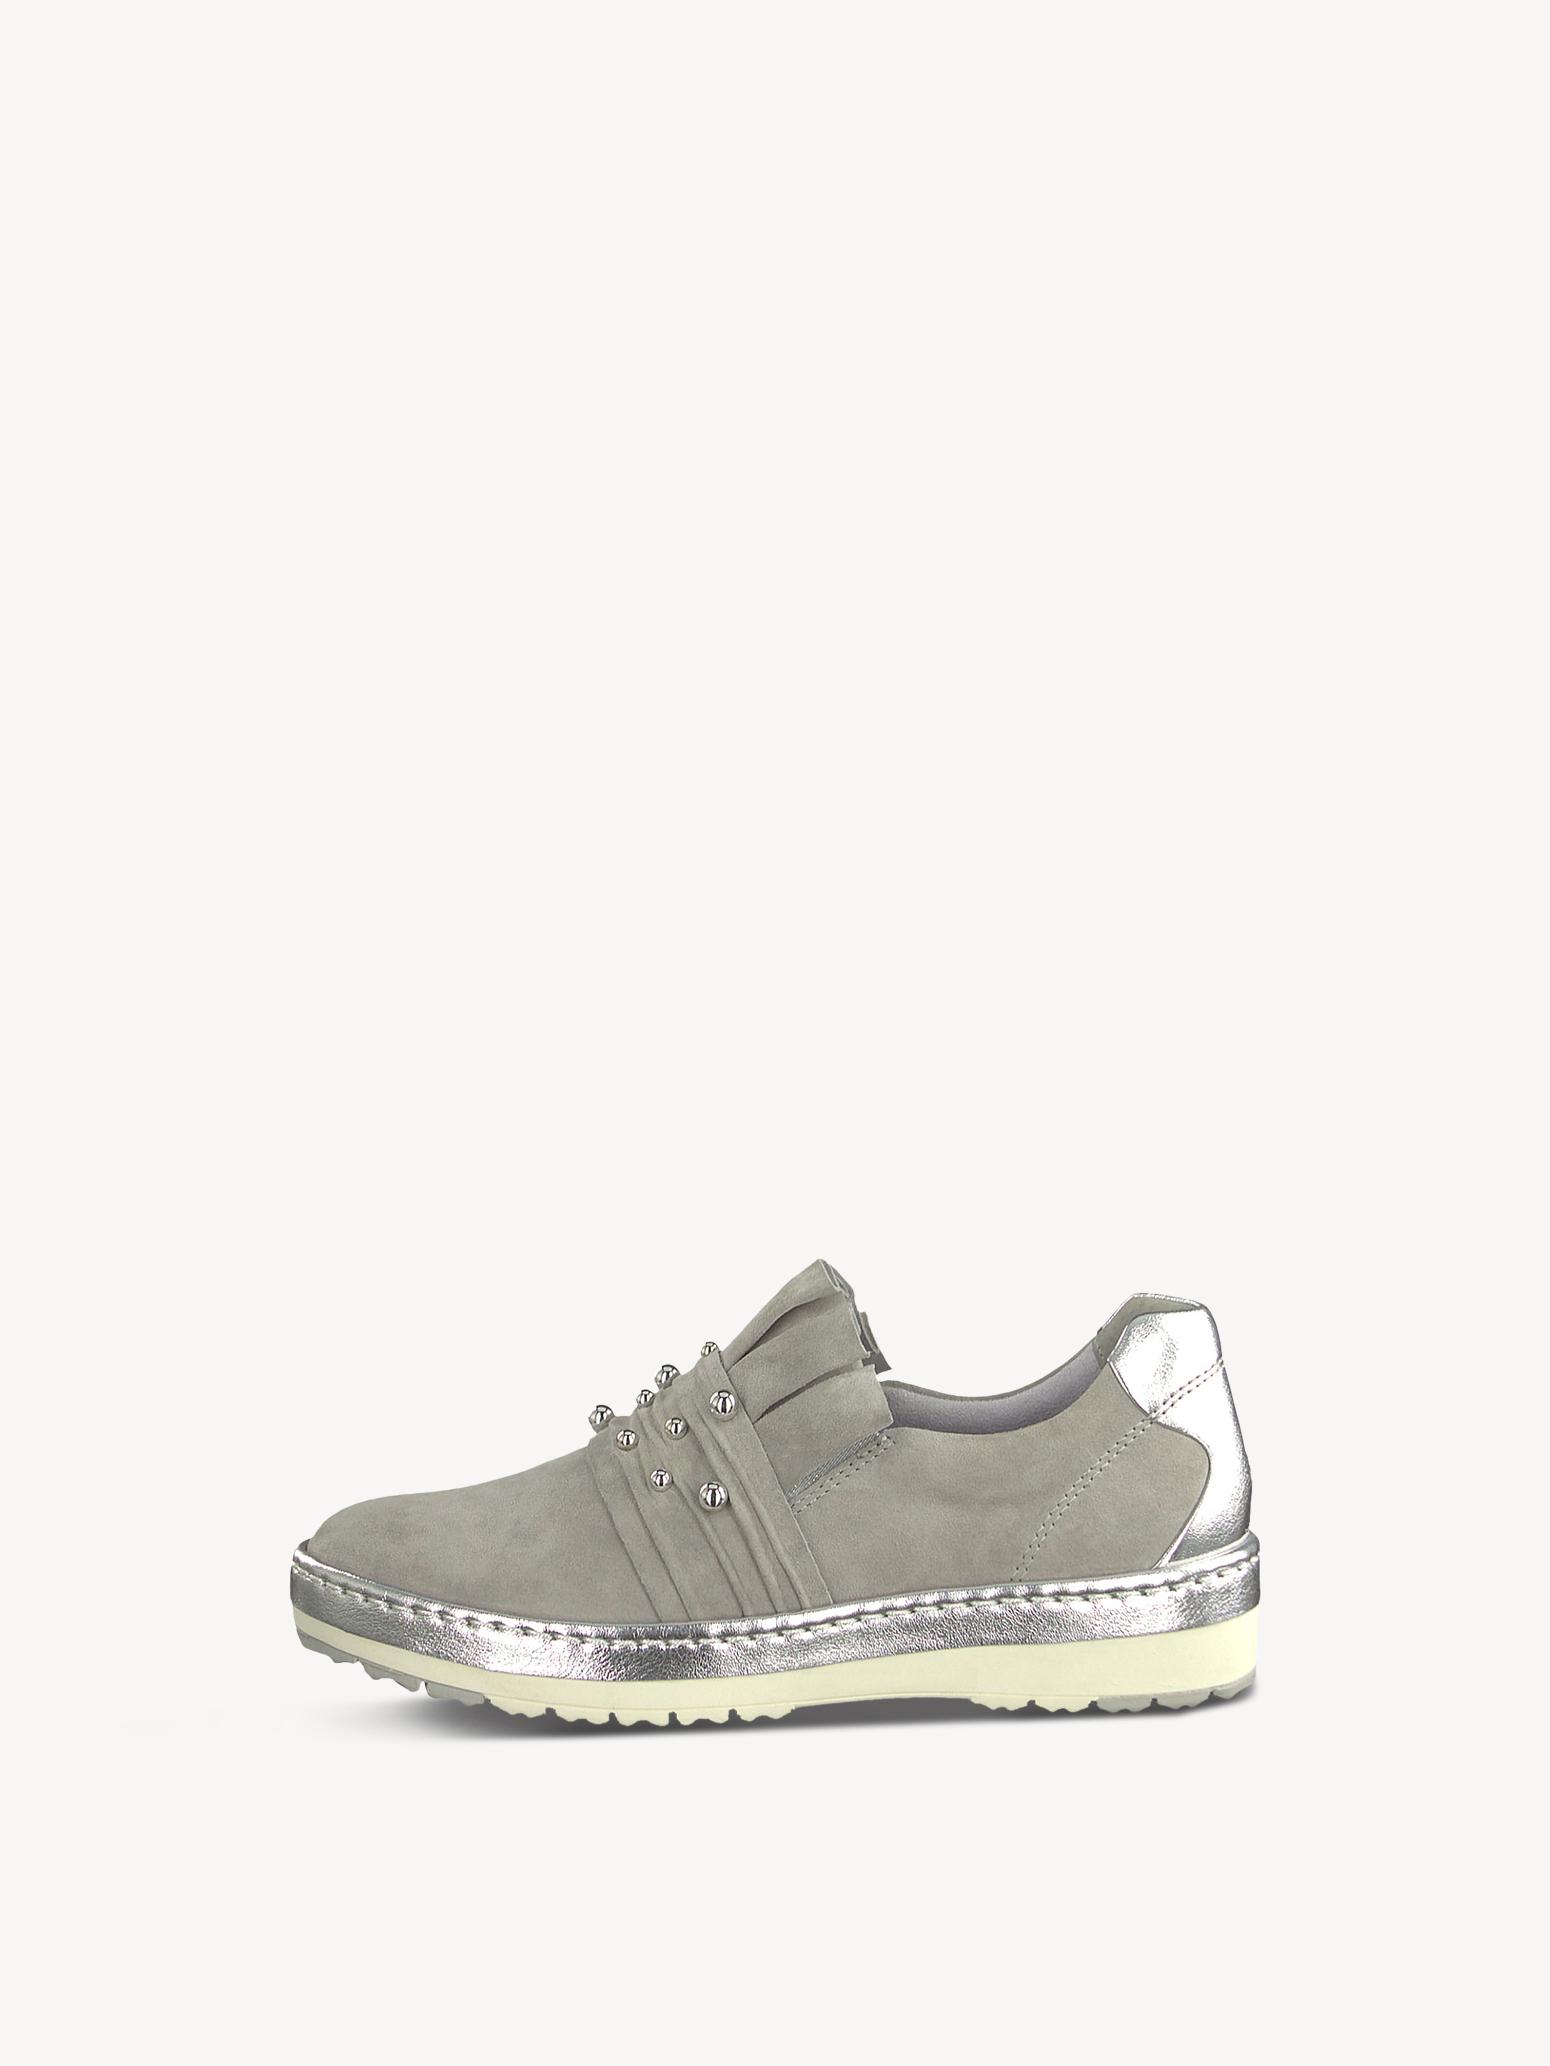 Chaussure tamaris escarpins basket